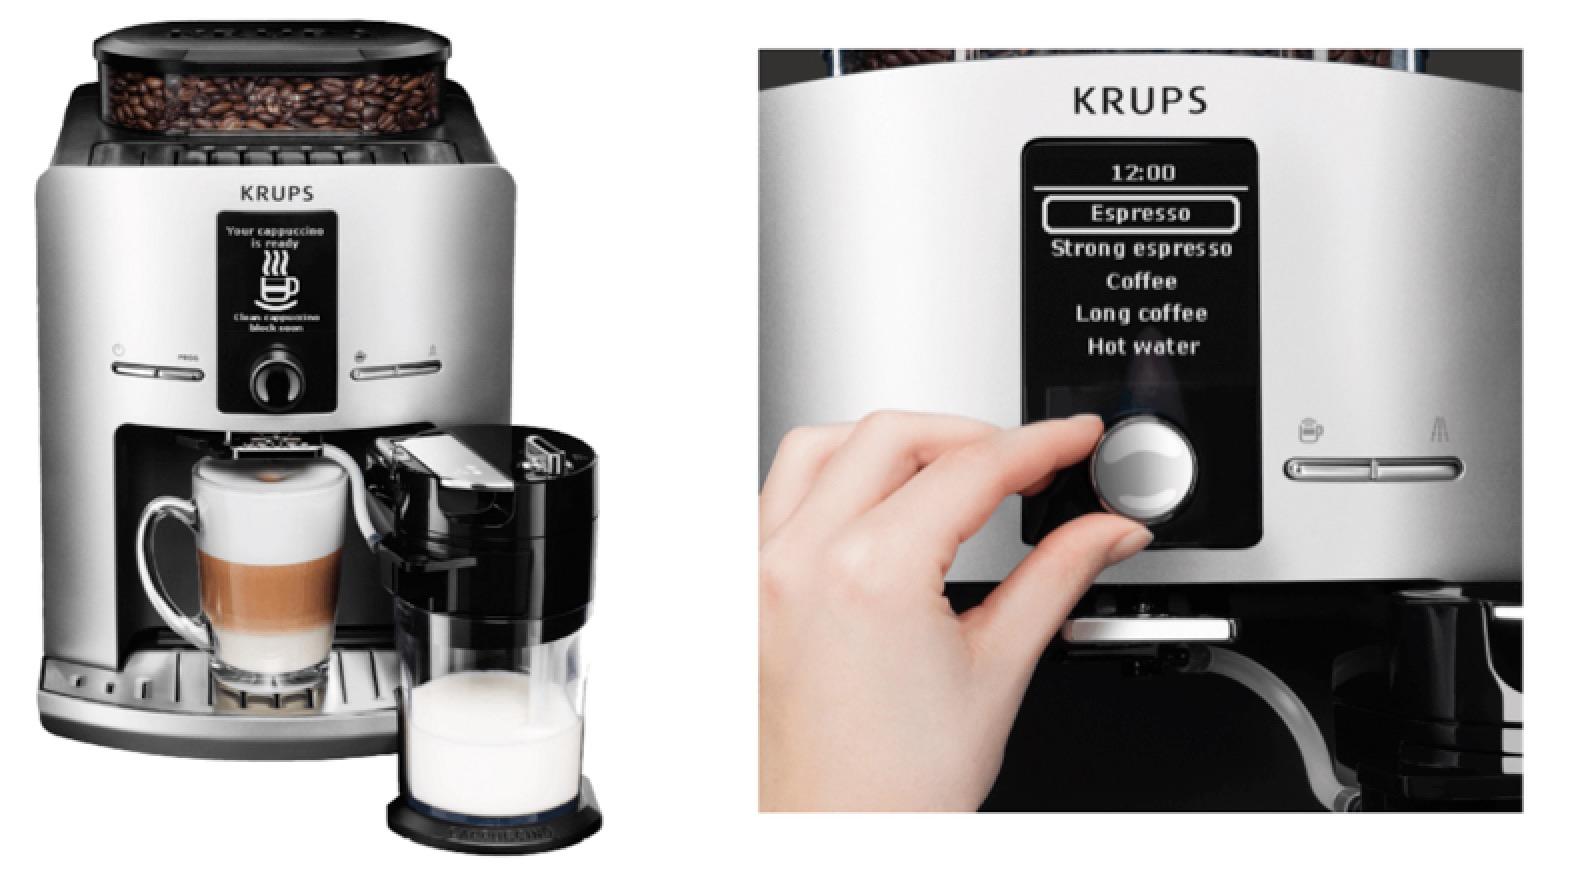 Krups Kaffeevollautomat bei Saturn